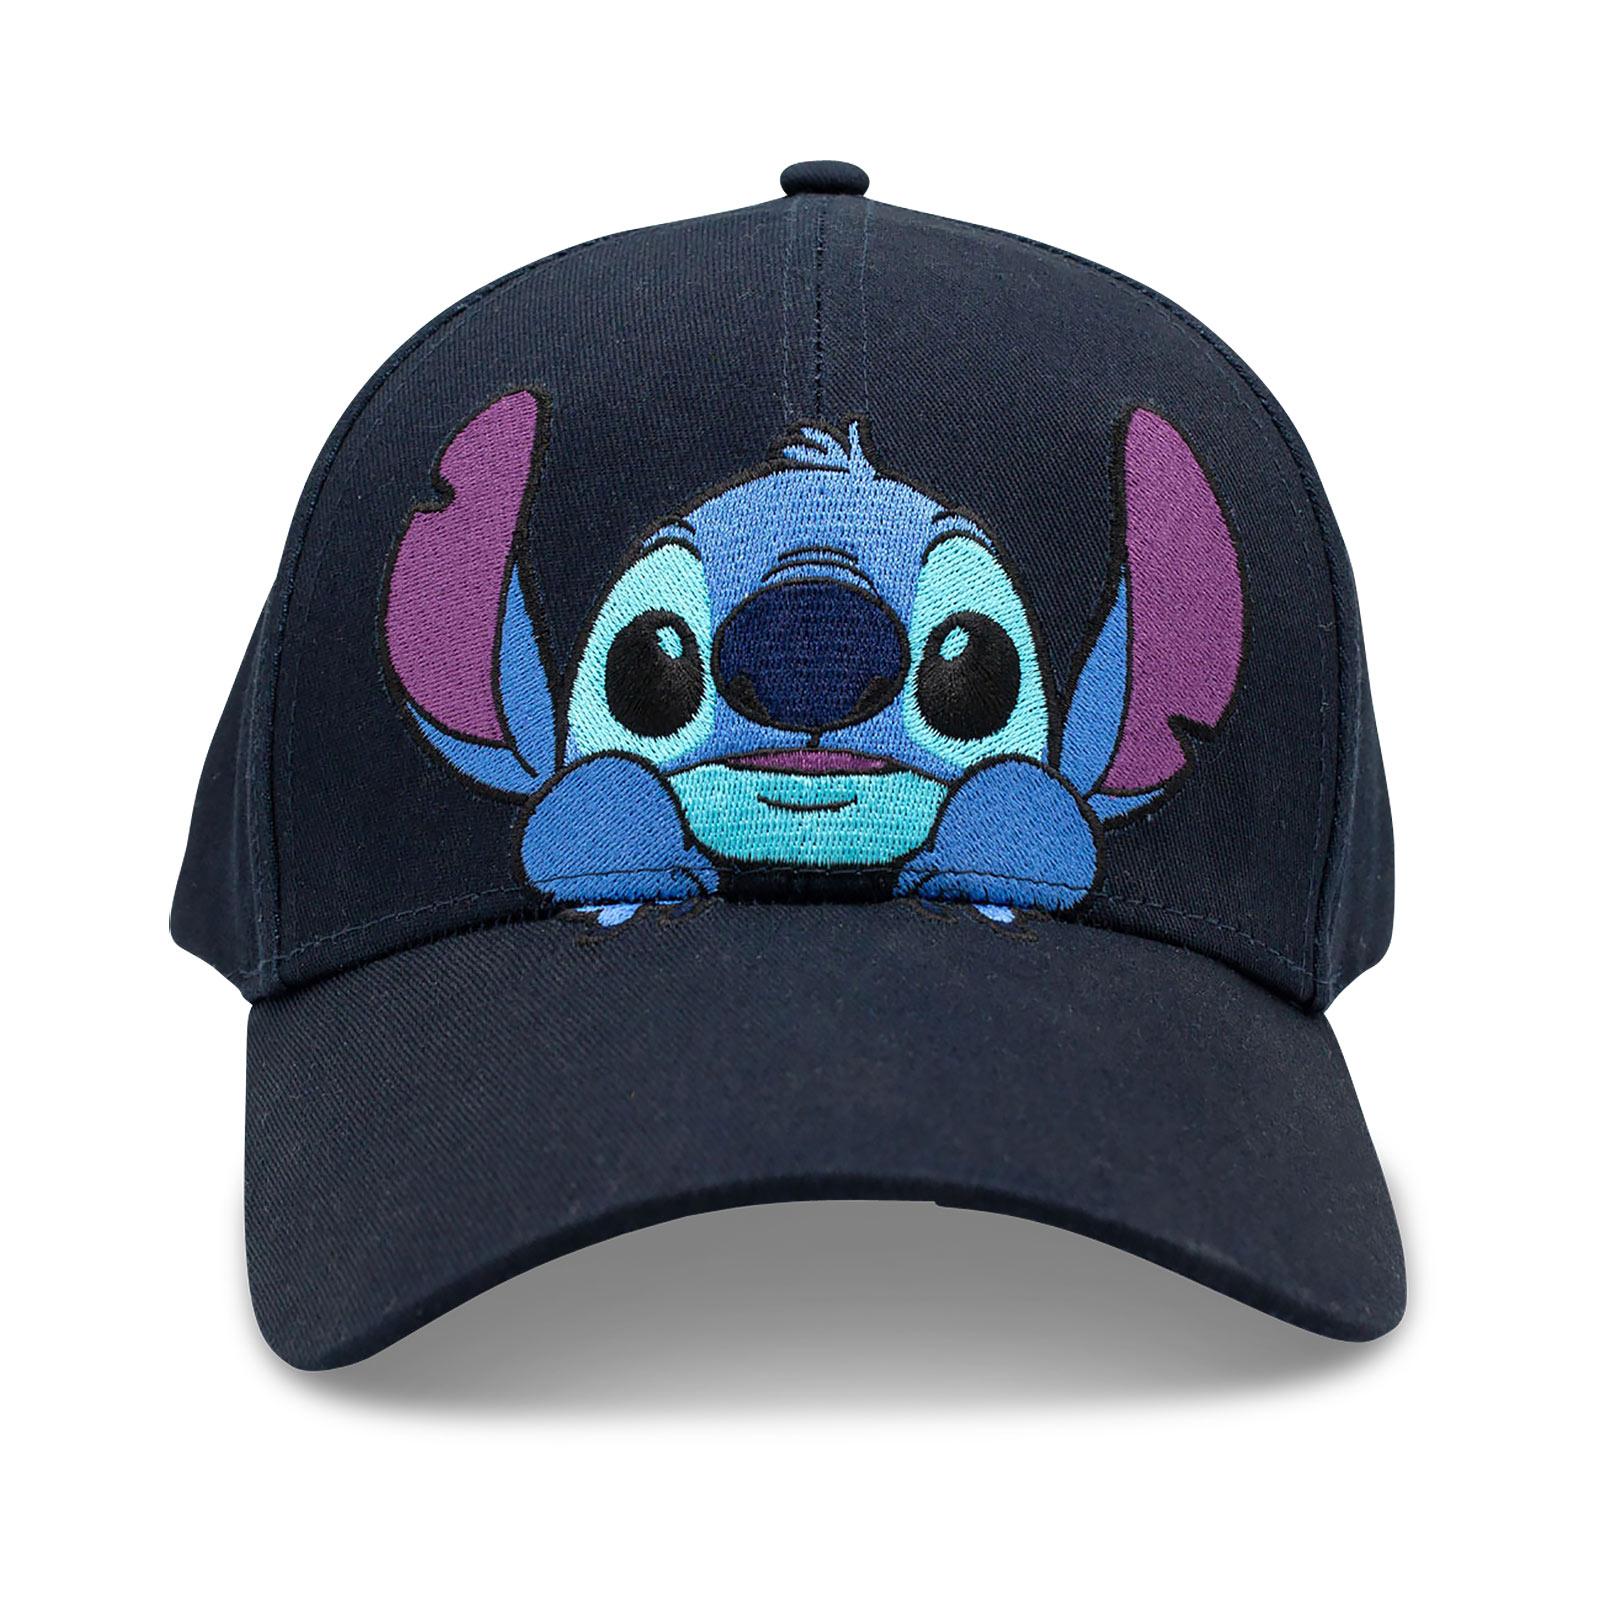 Lilo & Stitch - Stitch Basecap blau